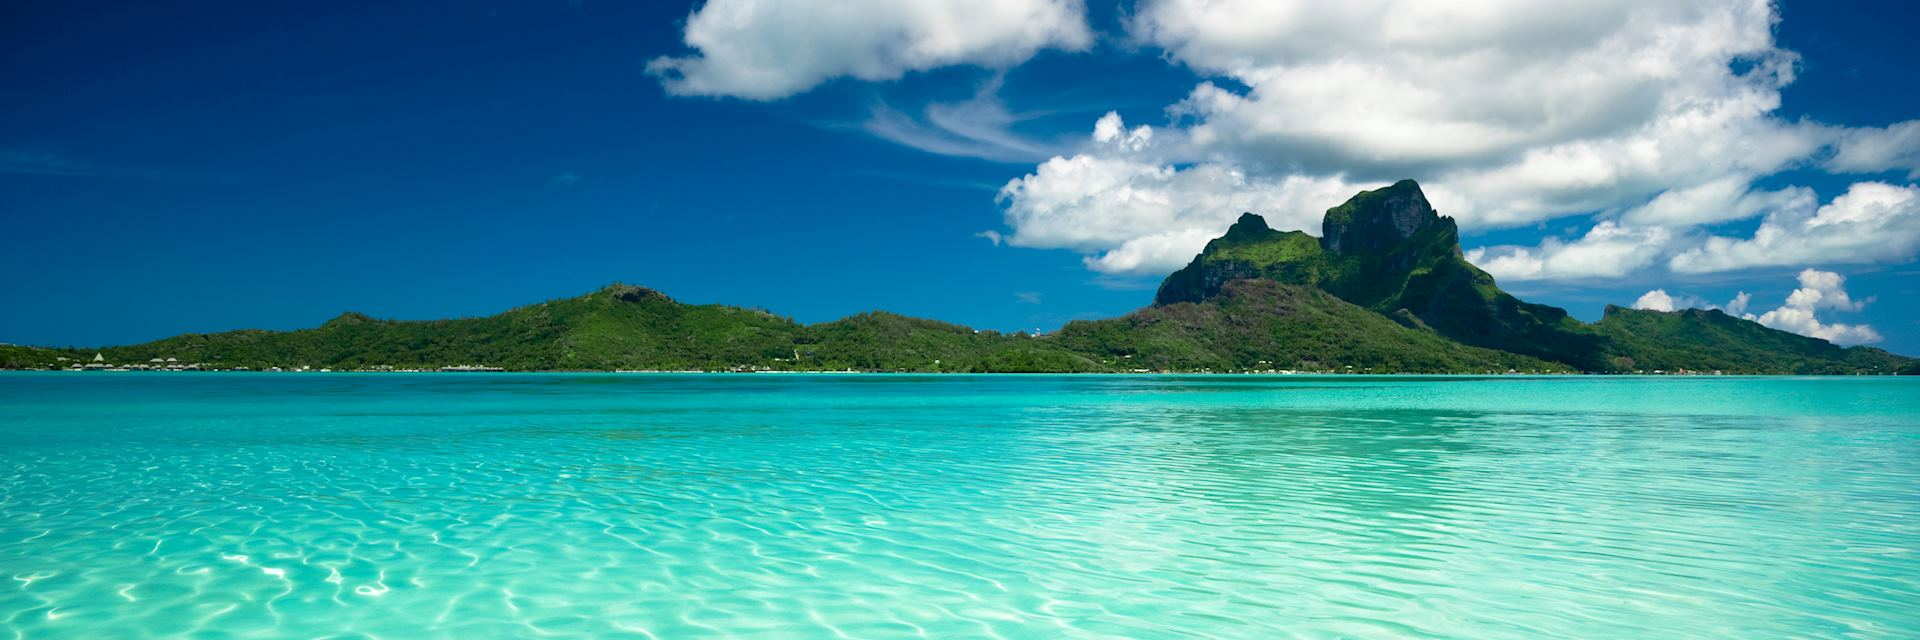 Clear waters off Bora Bora